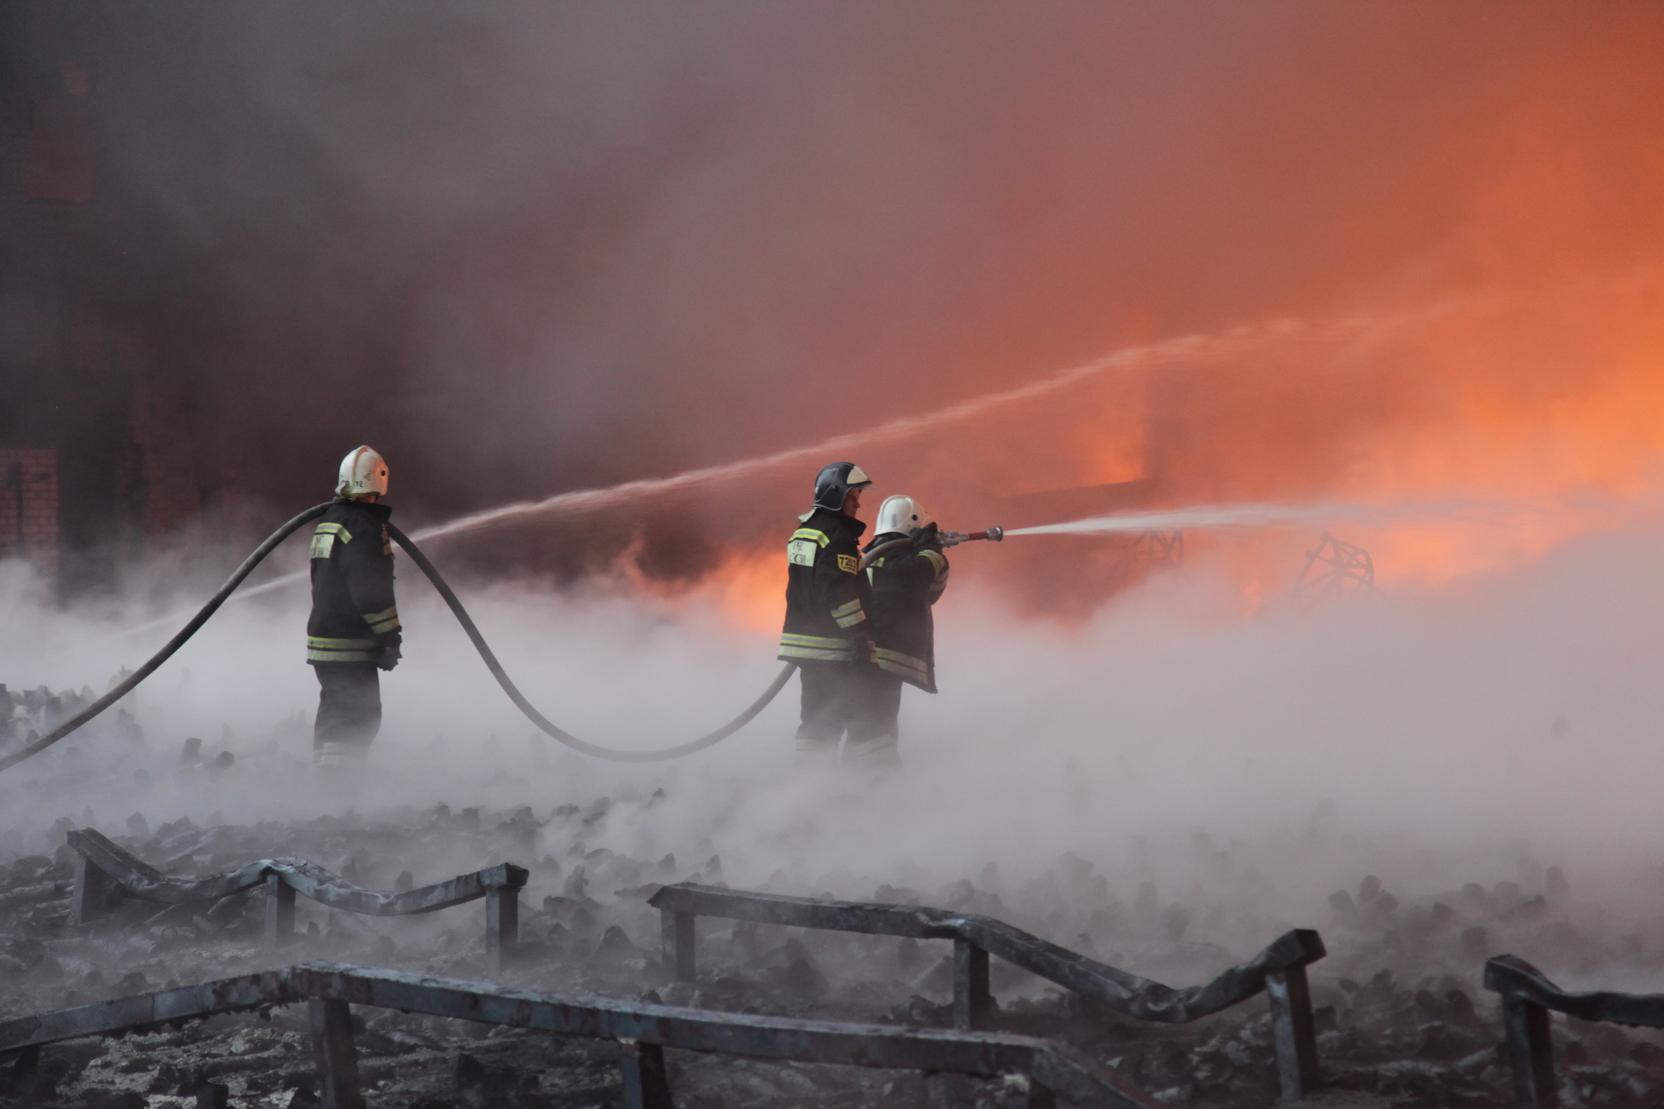 Стала известна причина пожара на НПЗ в Комсомольске-на-Амуре